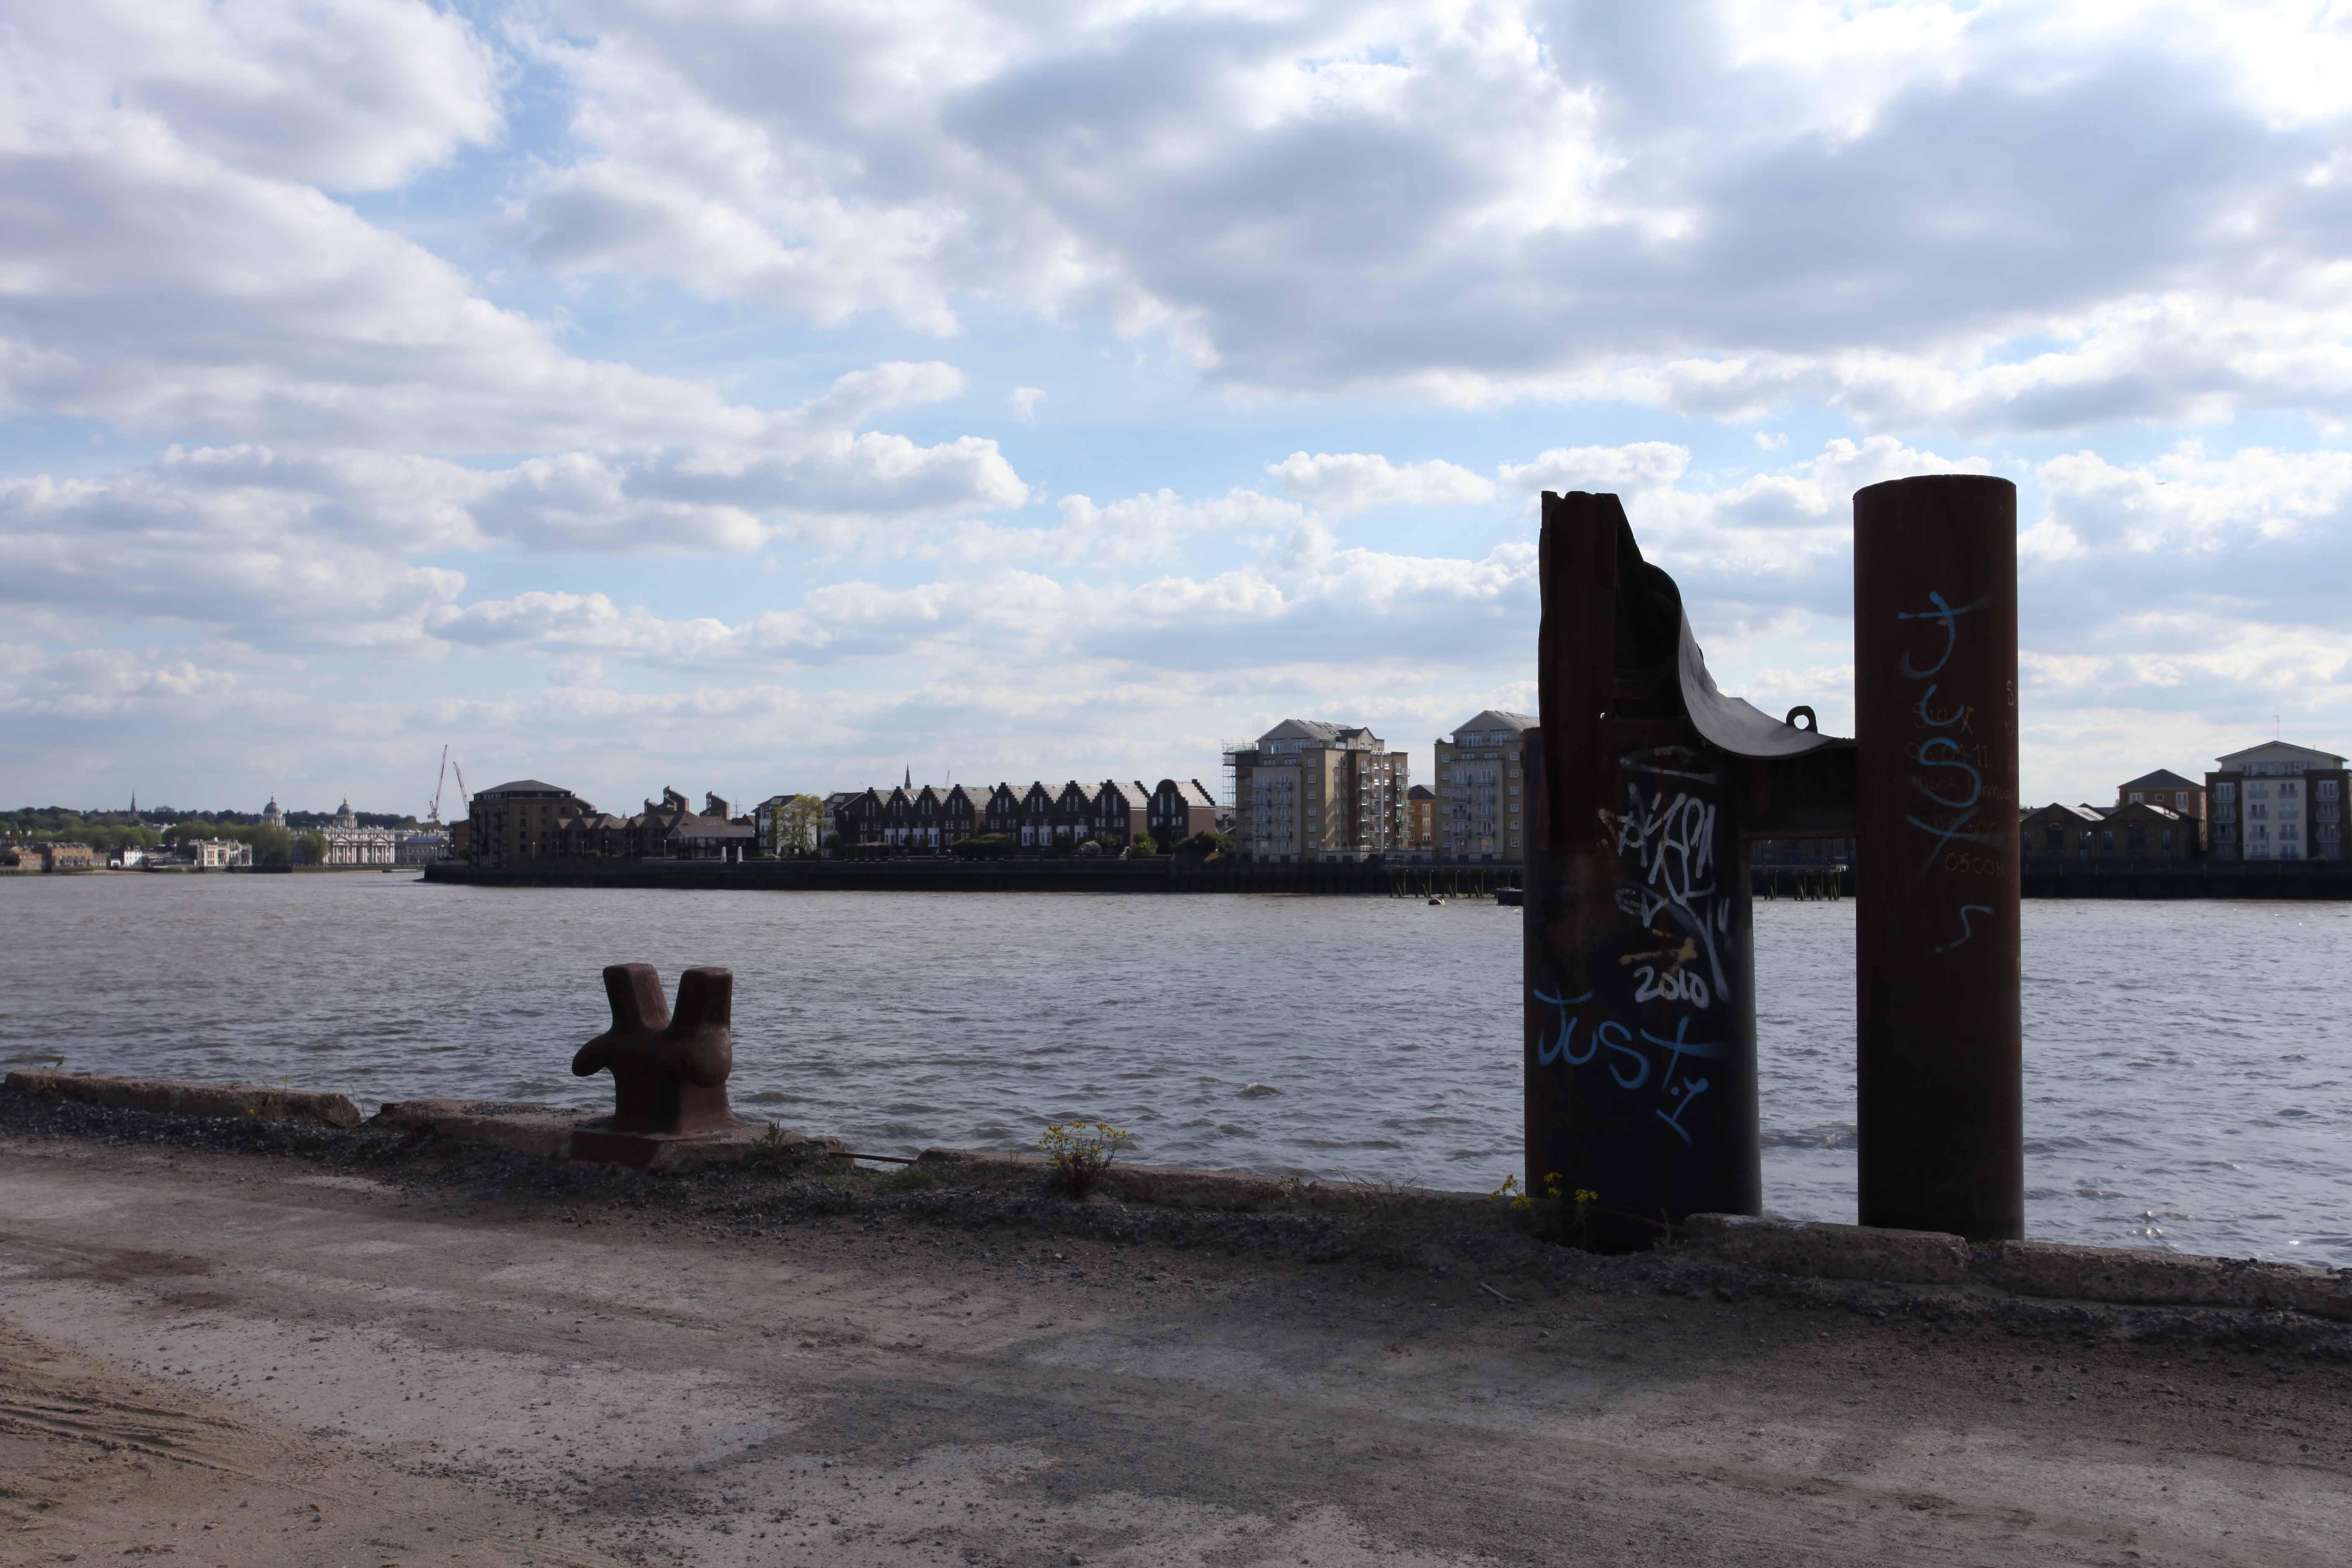 greenwich-river-walk-068